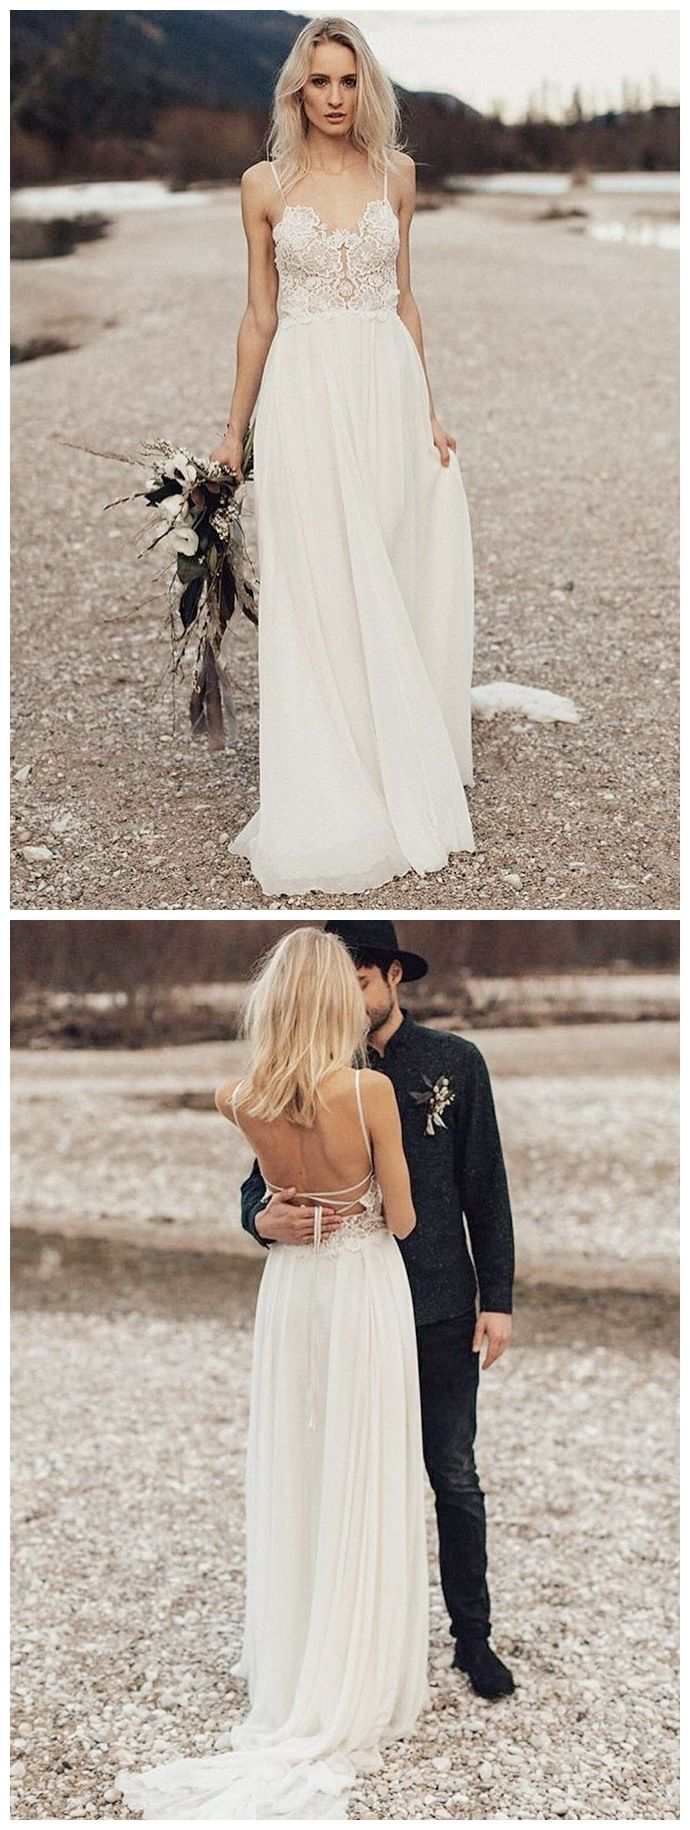 Best beach wedding dresses  Long Sleeve Lace Top Beach Wedding Dresses With Slit Cheap Rustic